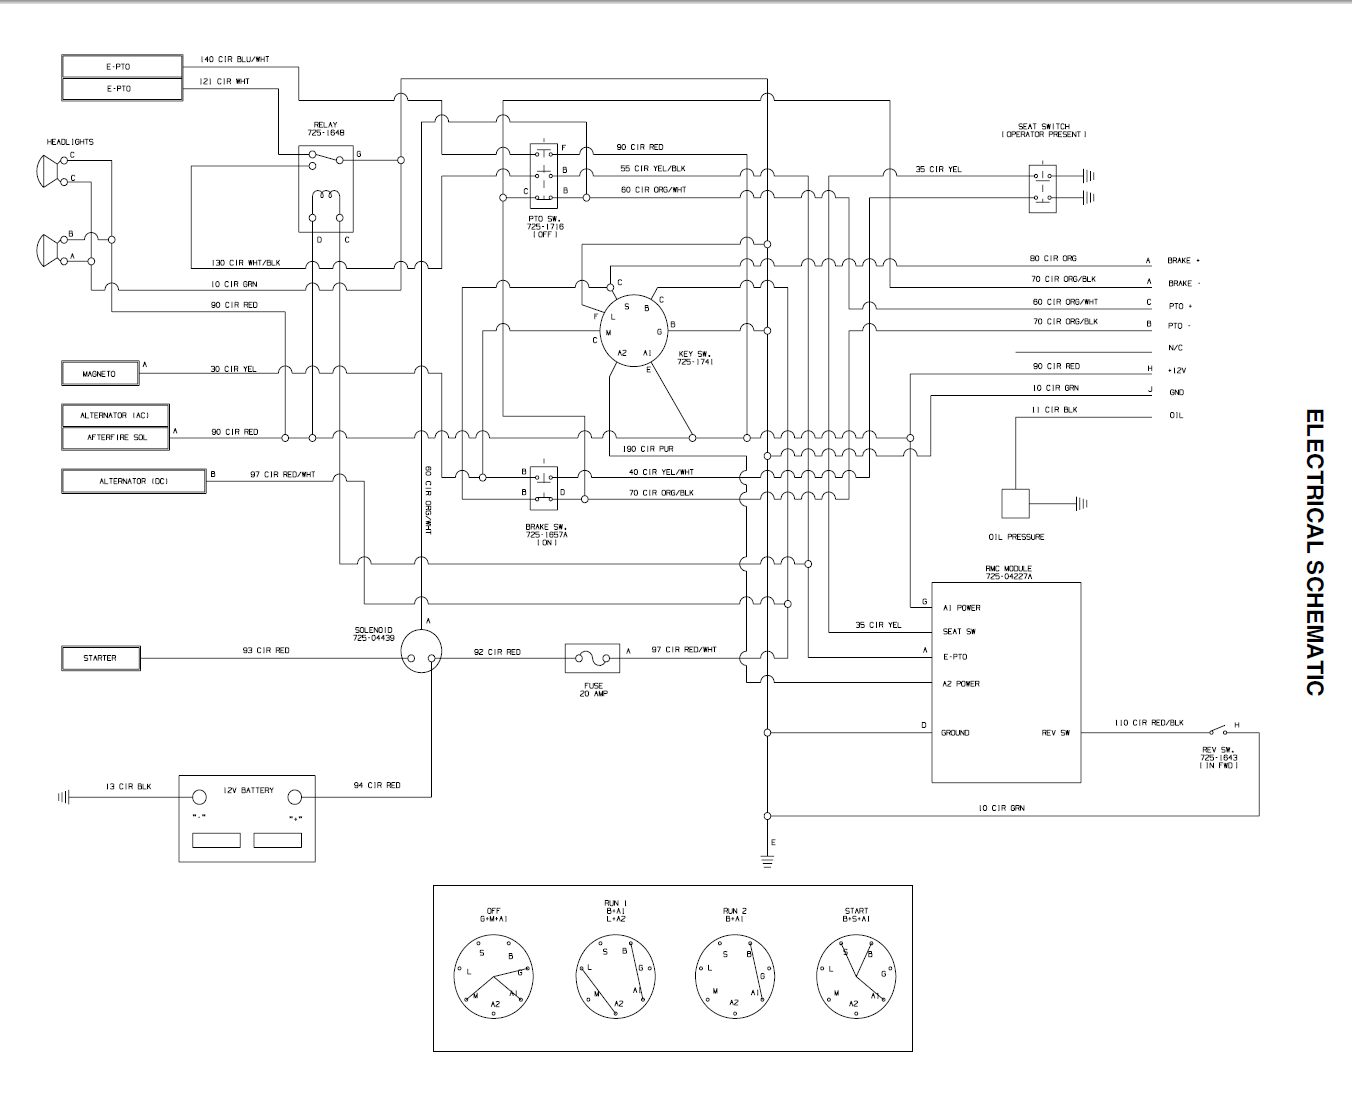 [DIAGRAM_09CH]  EC_1264] 1450 Cub Cadet Engine Diagram Schematic Wiring | Cub Cadet 3184 Wiring Diagram |  | Ungo Dadea Ricis Lline Wned Icism Bemua None Phil Wigeg Mohammedshrine  Librar Wiring 101